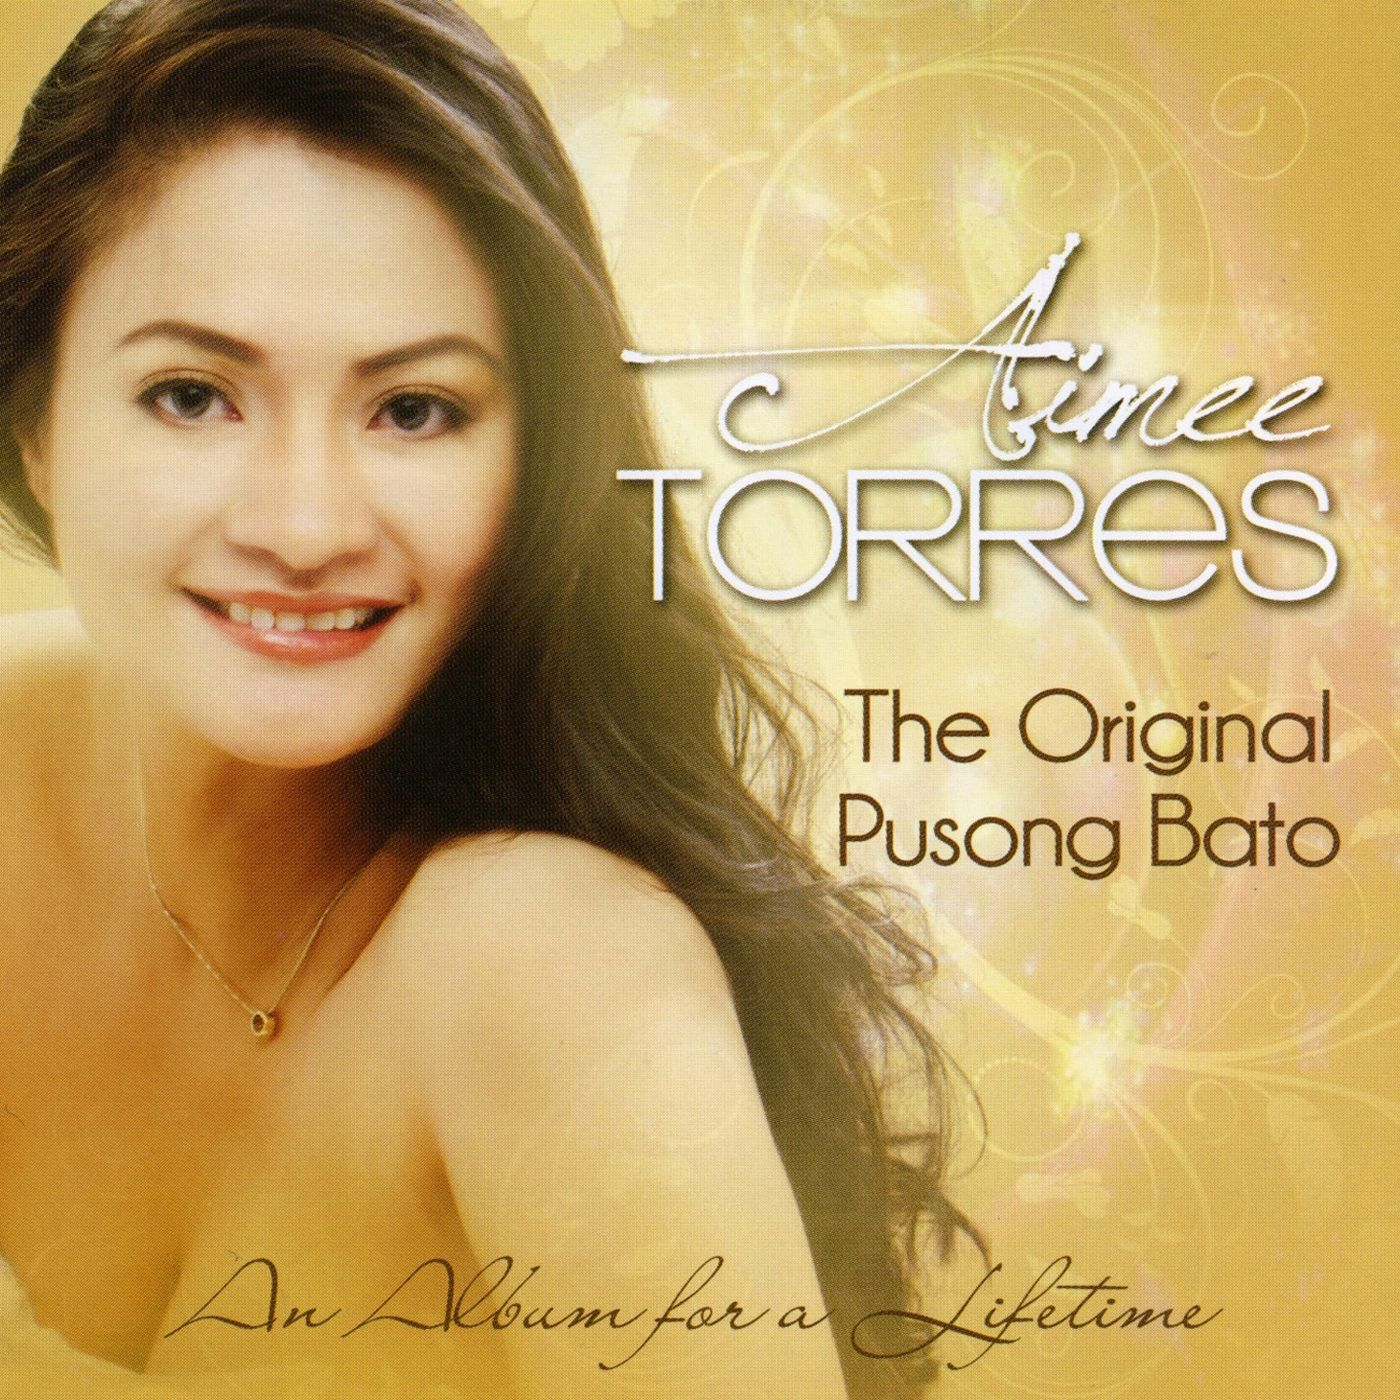 0a982fe34 Aimee Torres - The Original Pusong Bato - Aimee Torres - 2012 Album ...